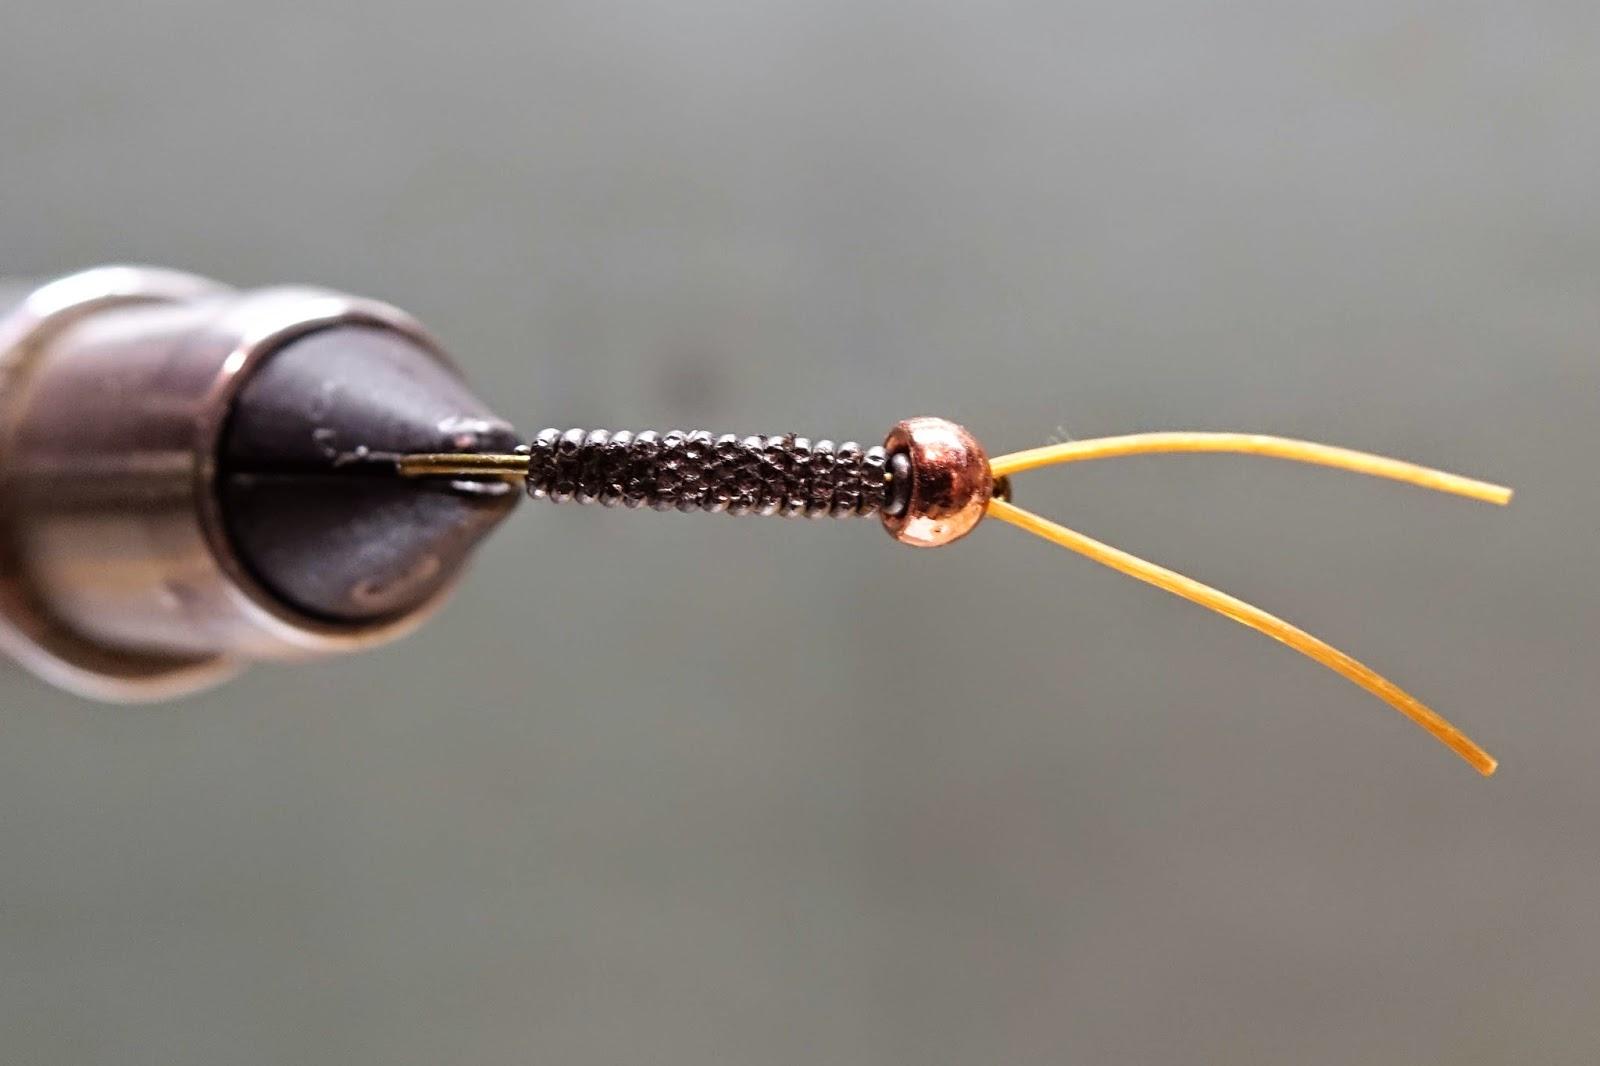 Fishing small streams: Euro nymphing - Part II. Anchor flies